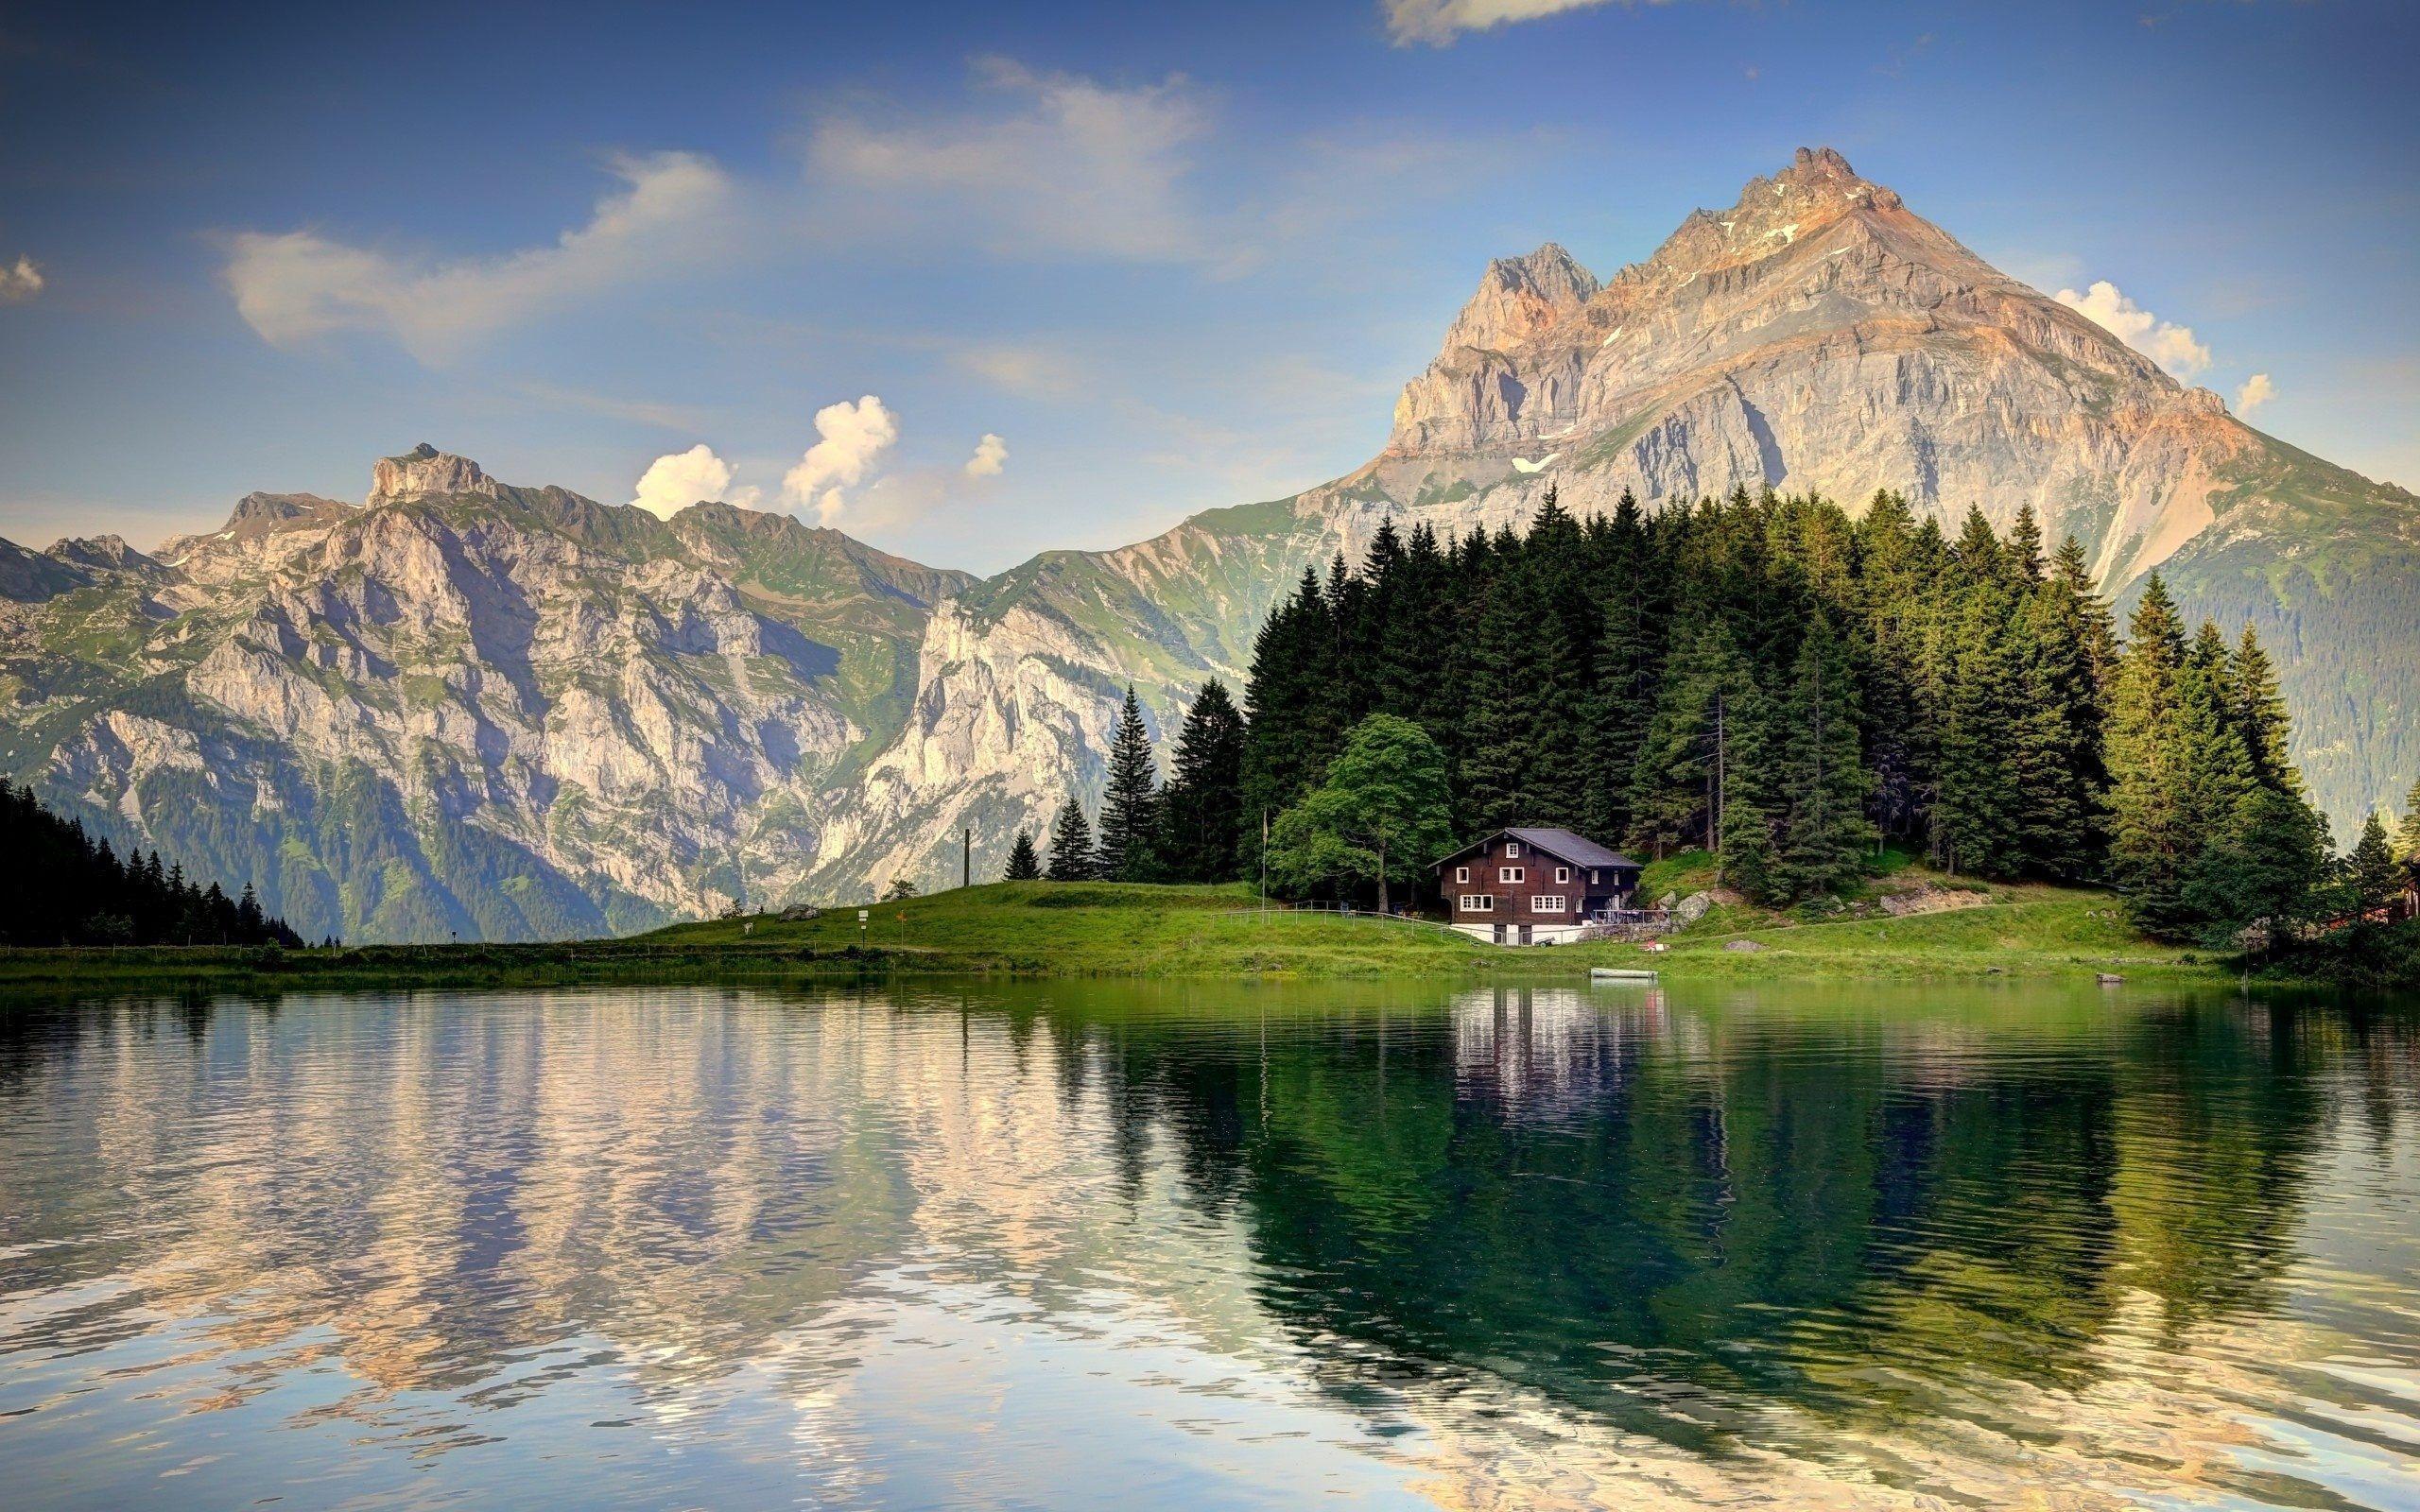 Alps Landscape Wallpapers Top Free Alps Landscape